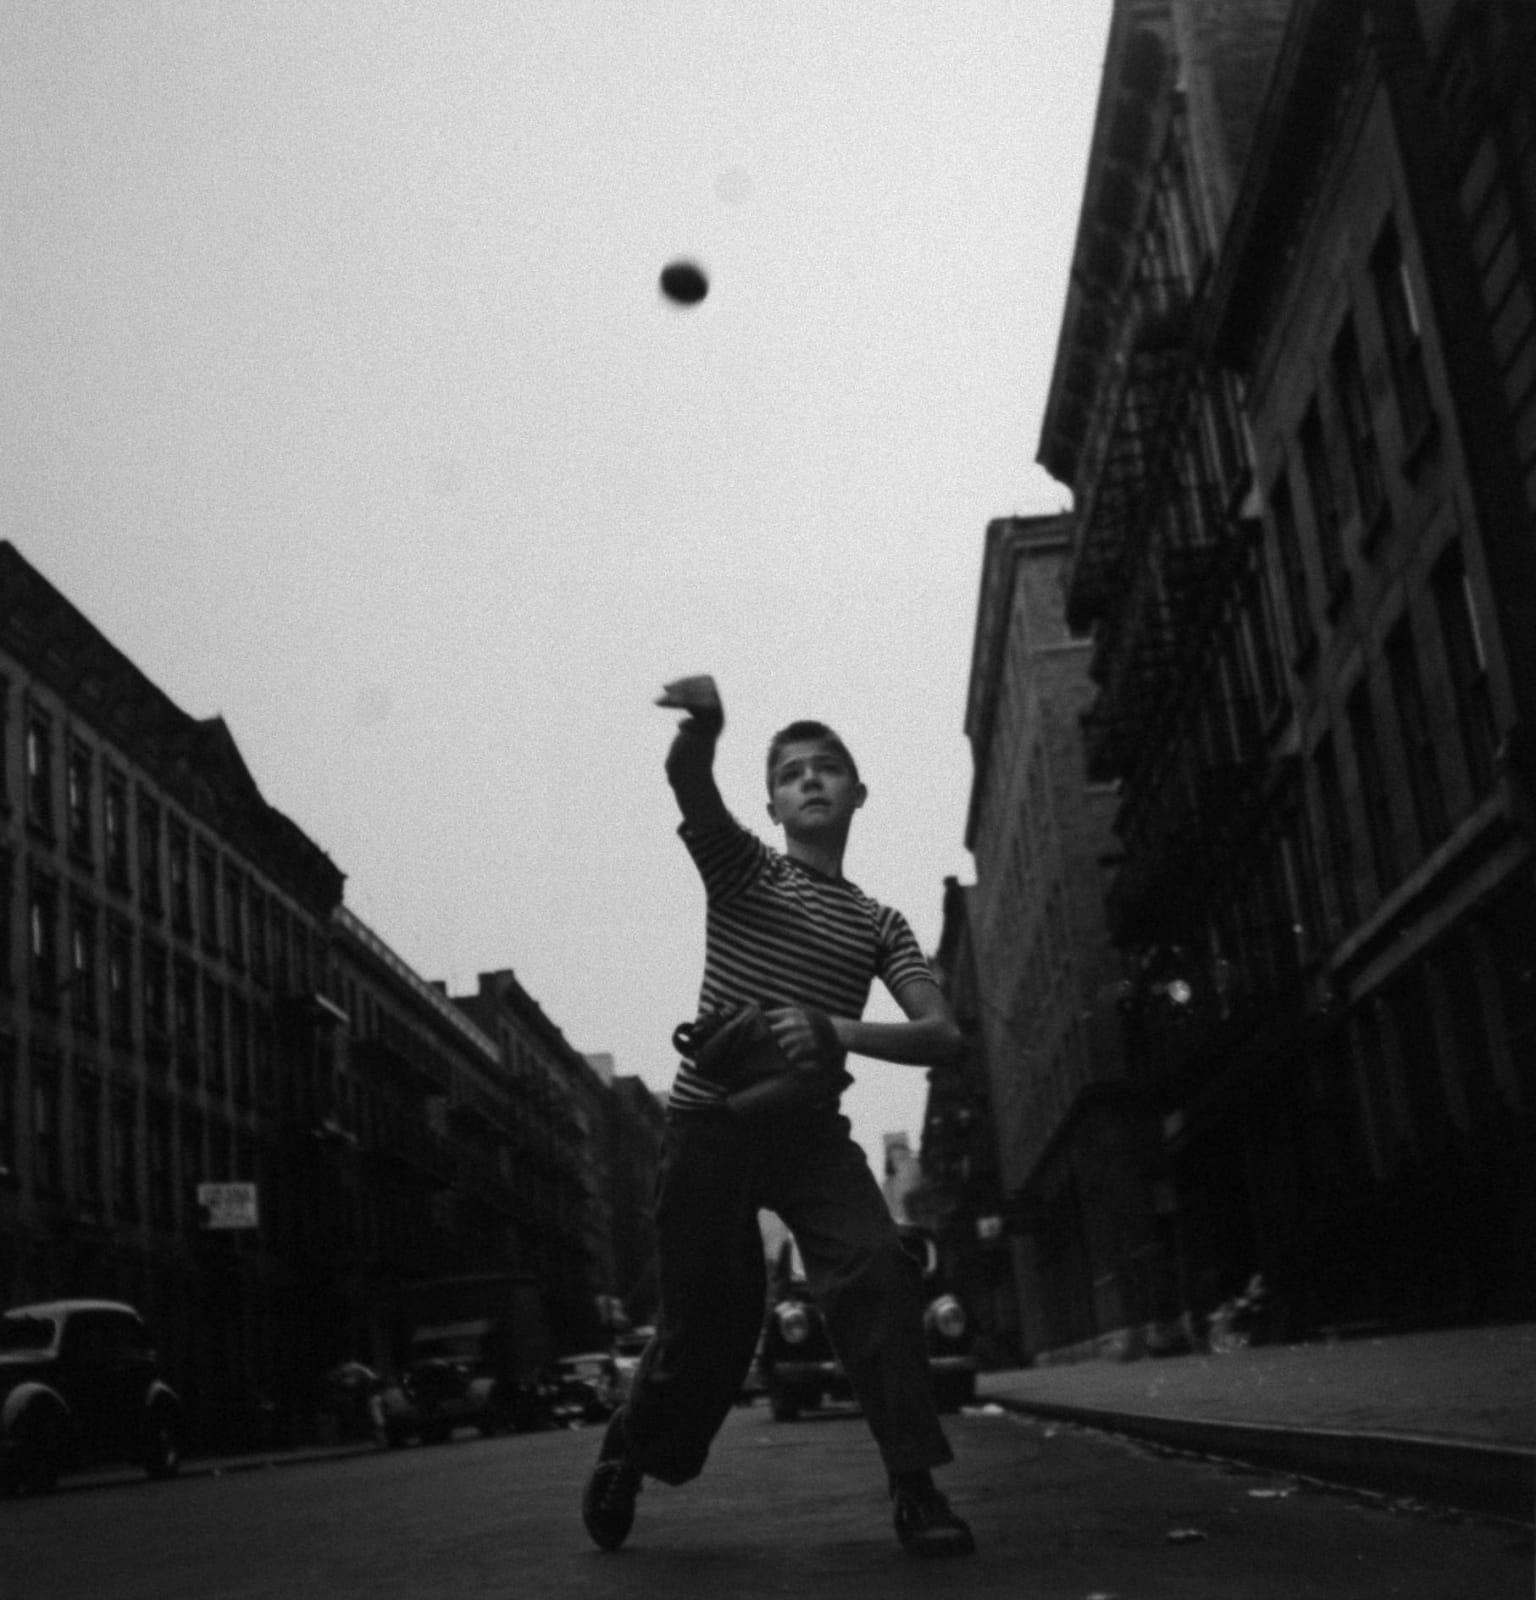 SOLD: Cornell Capa - Pitching Ball, New York City, 1948